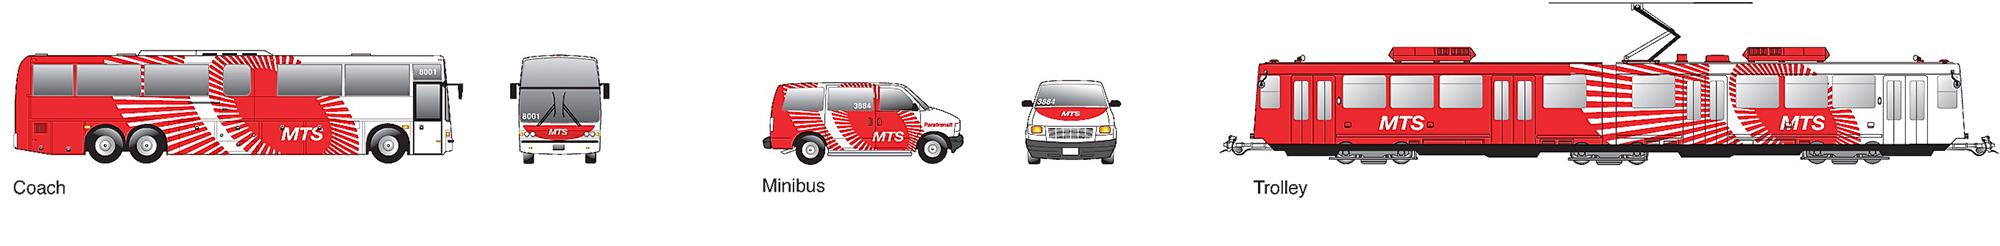 ron-miriello-grafico-mts-bus-san-diego-trolley-design-branding-05jpg